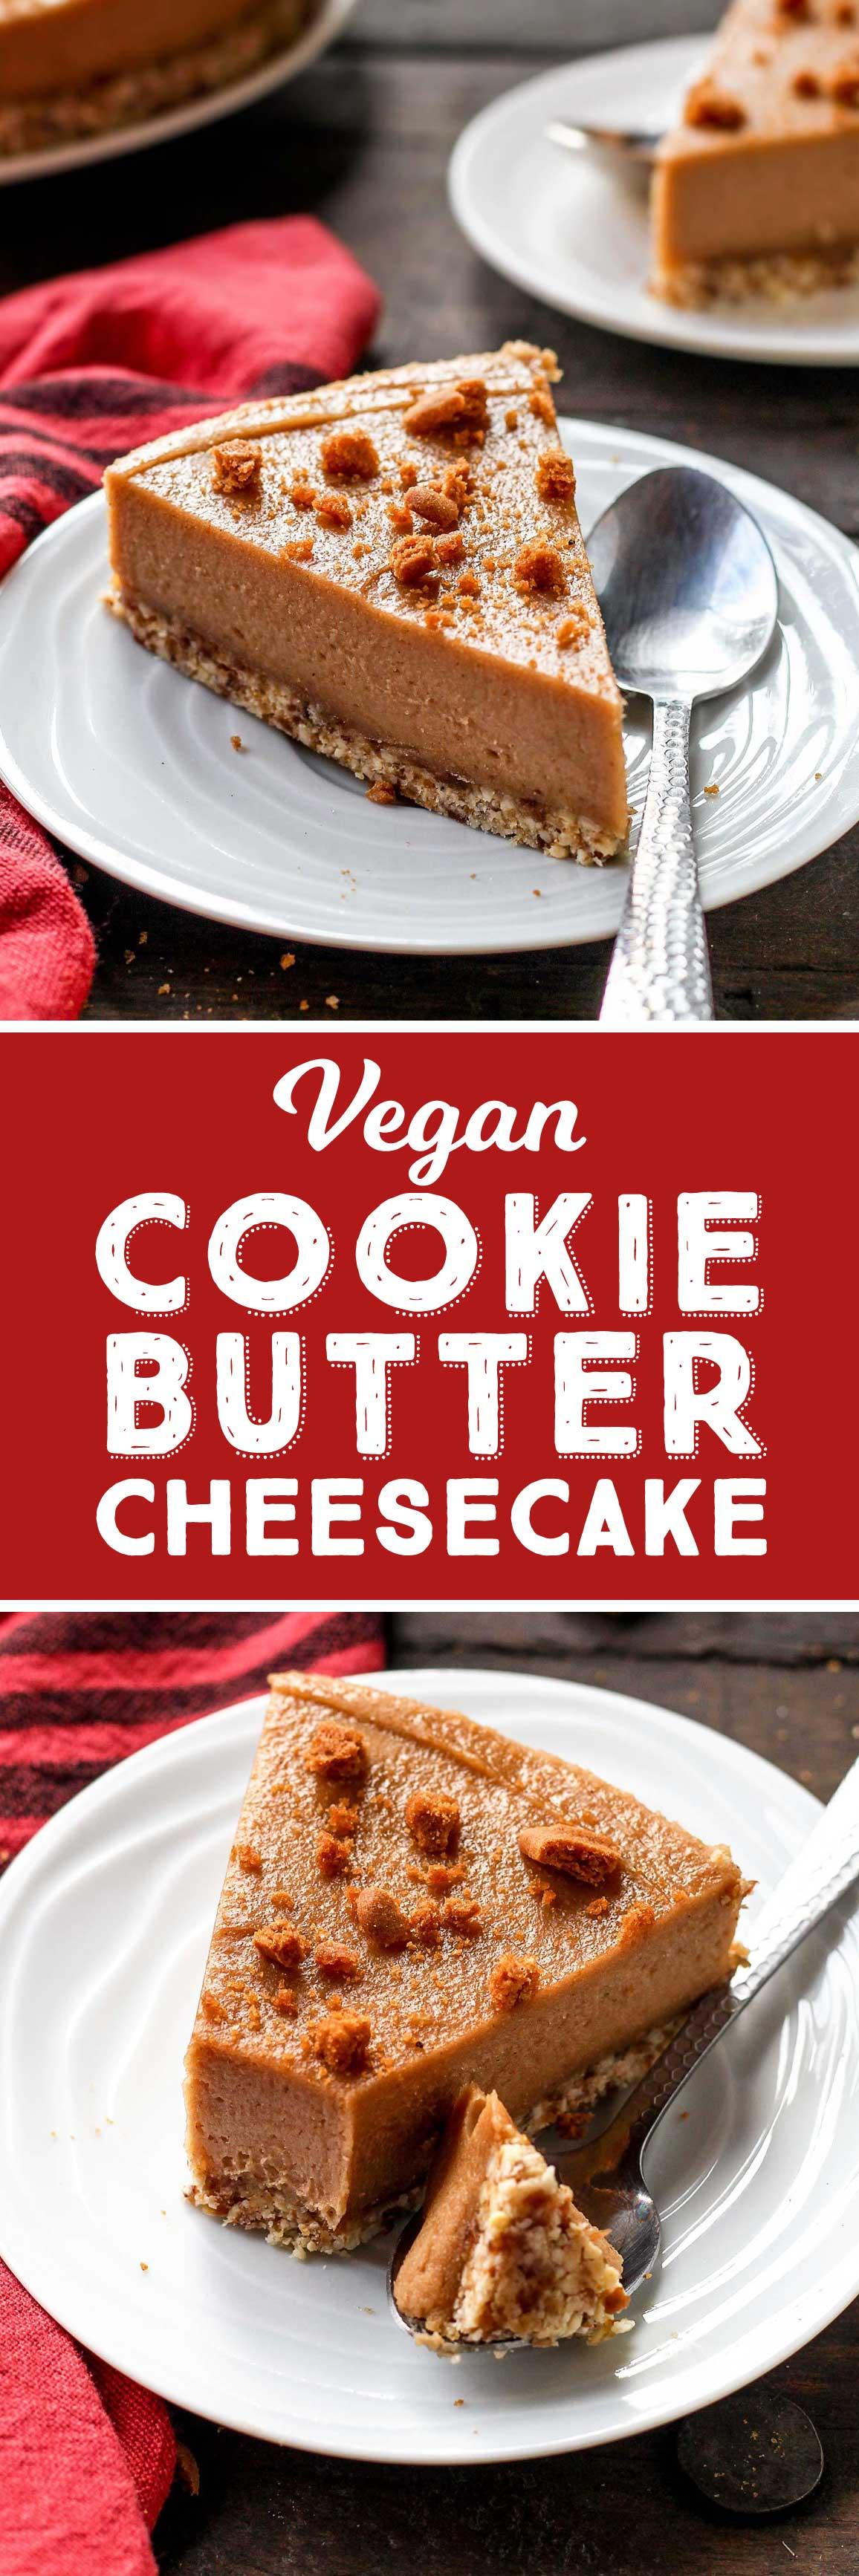 Vegan Cookie Butter Cheesecake